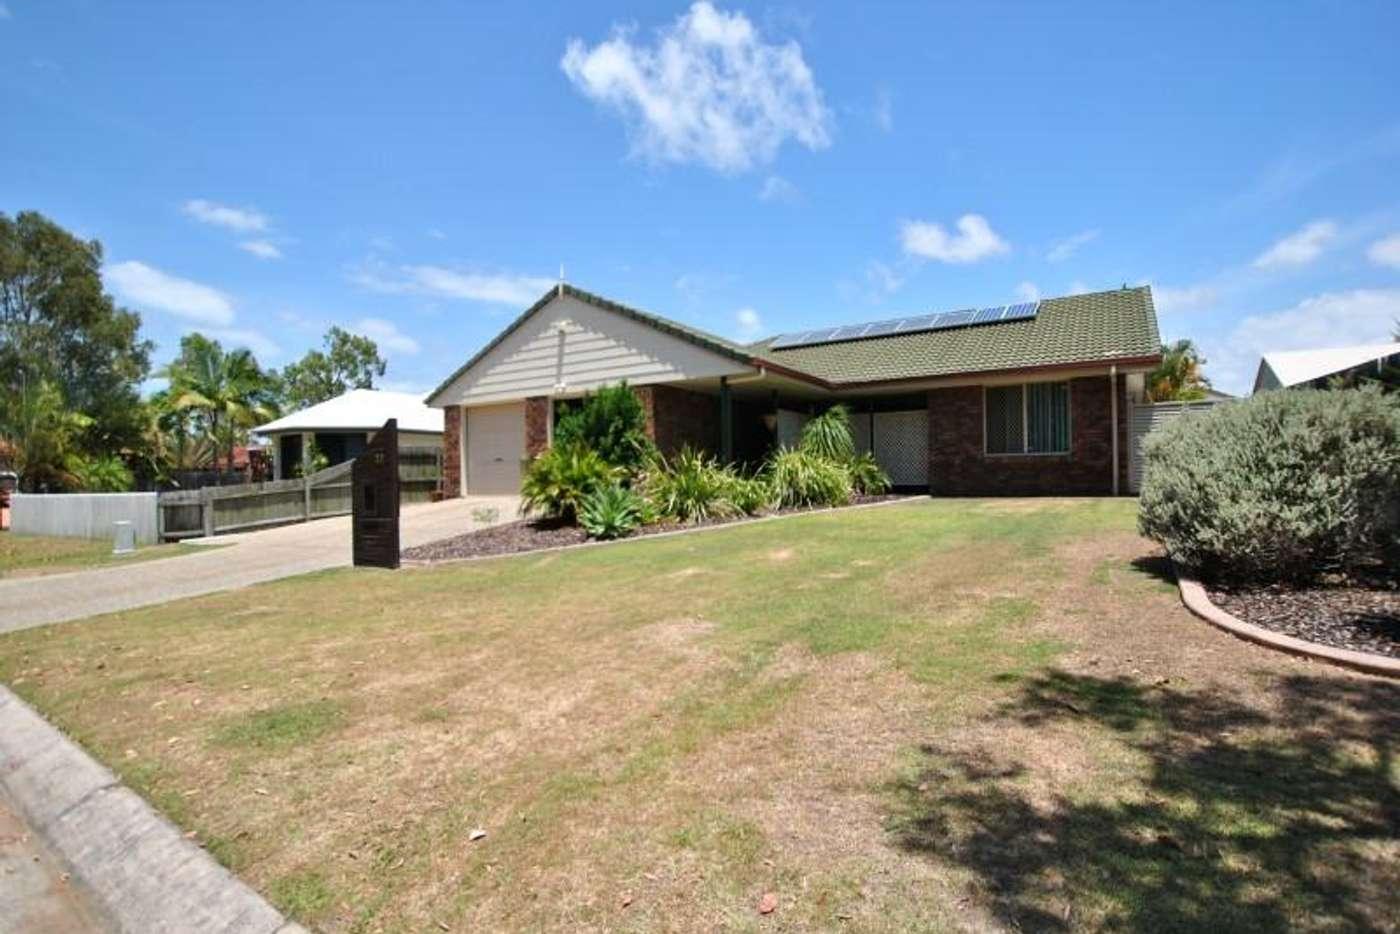 Main view of Homely house listing, 22 Sunjewel Boulevard, Currimundi QLD 4551